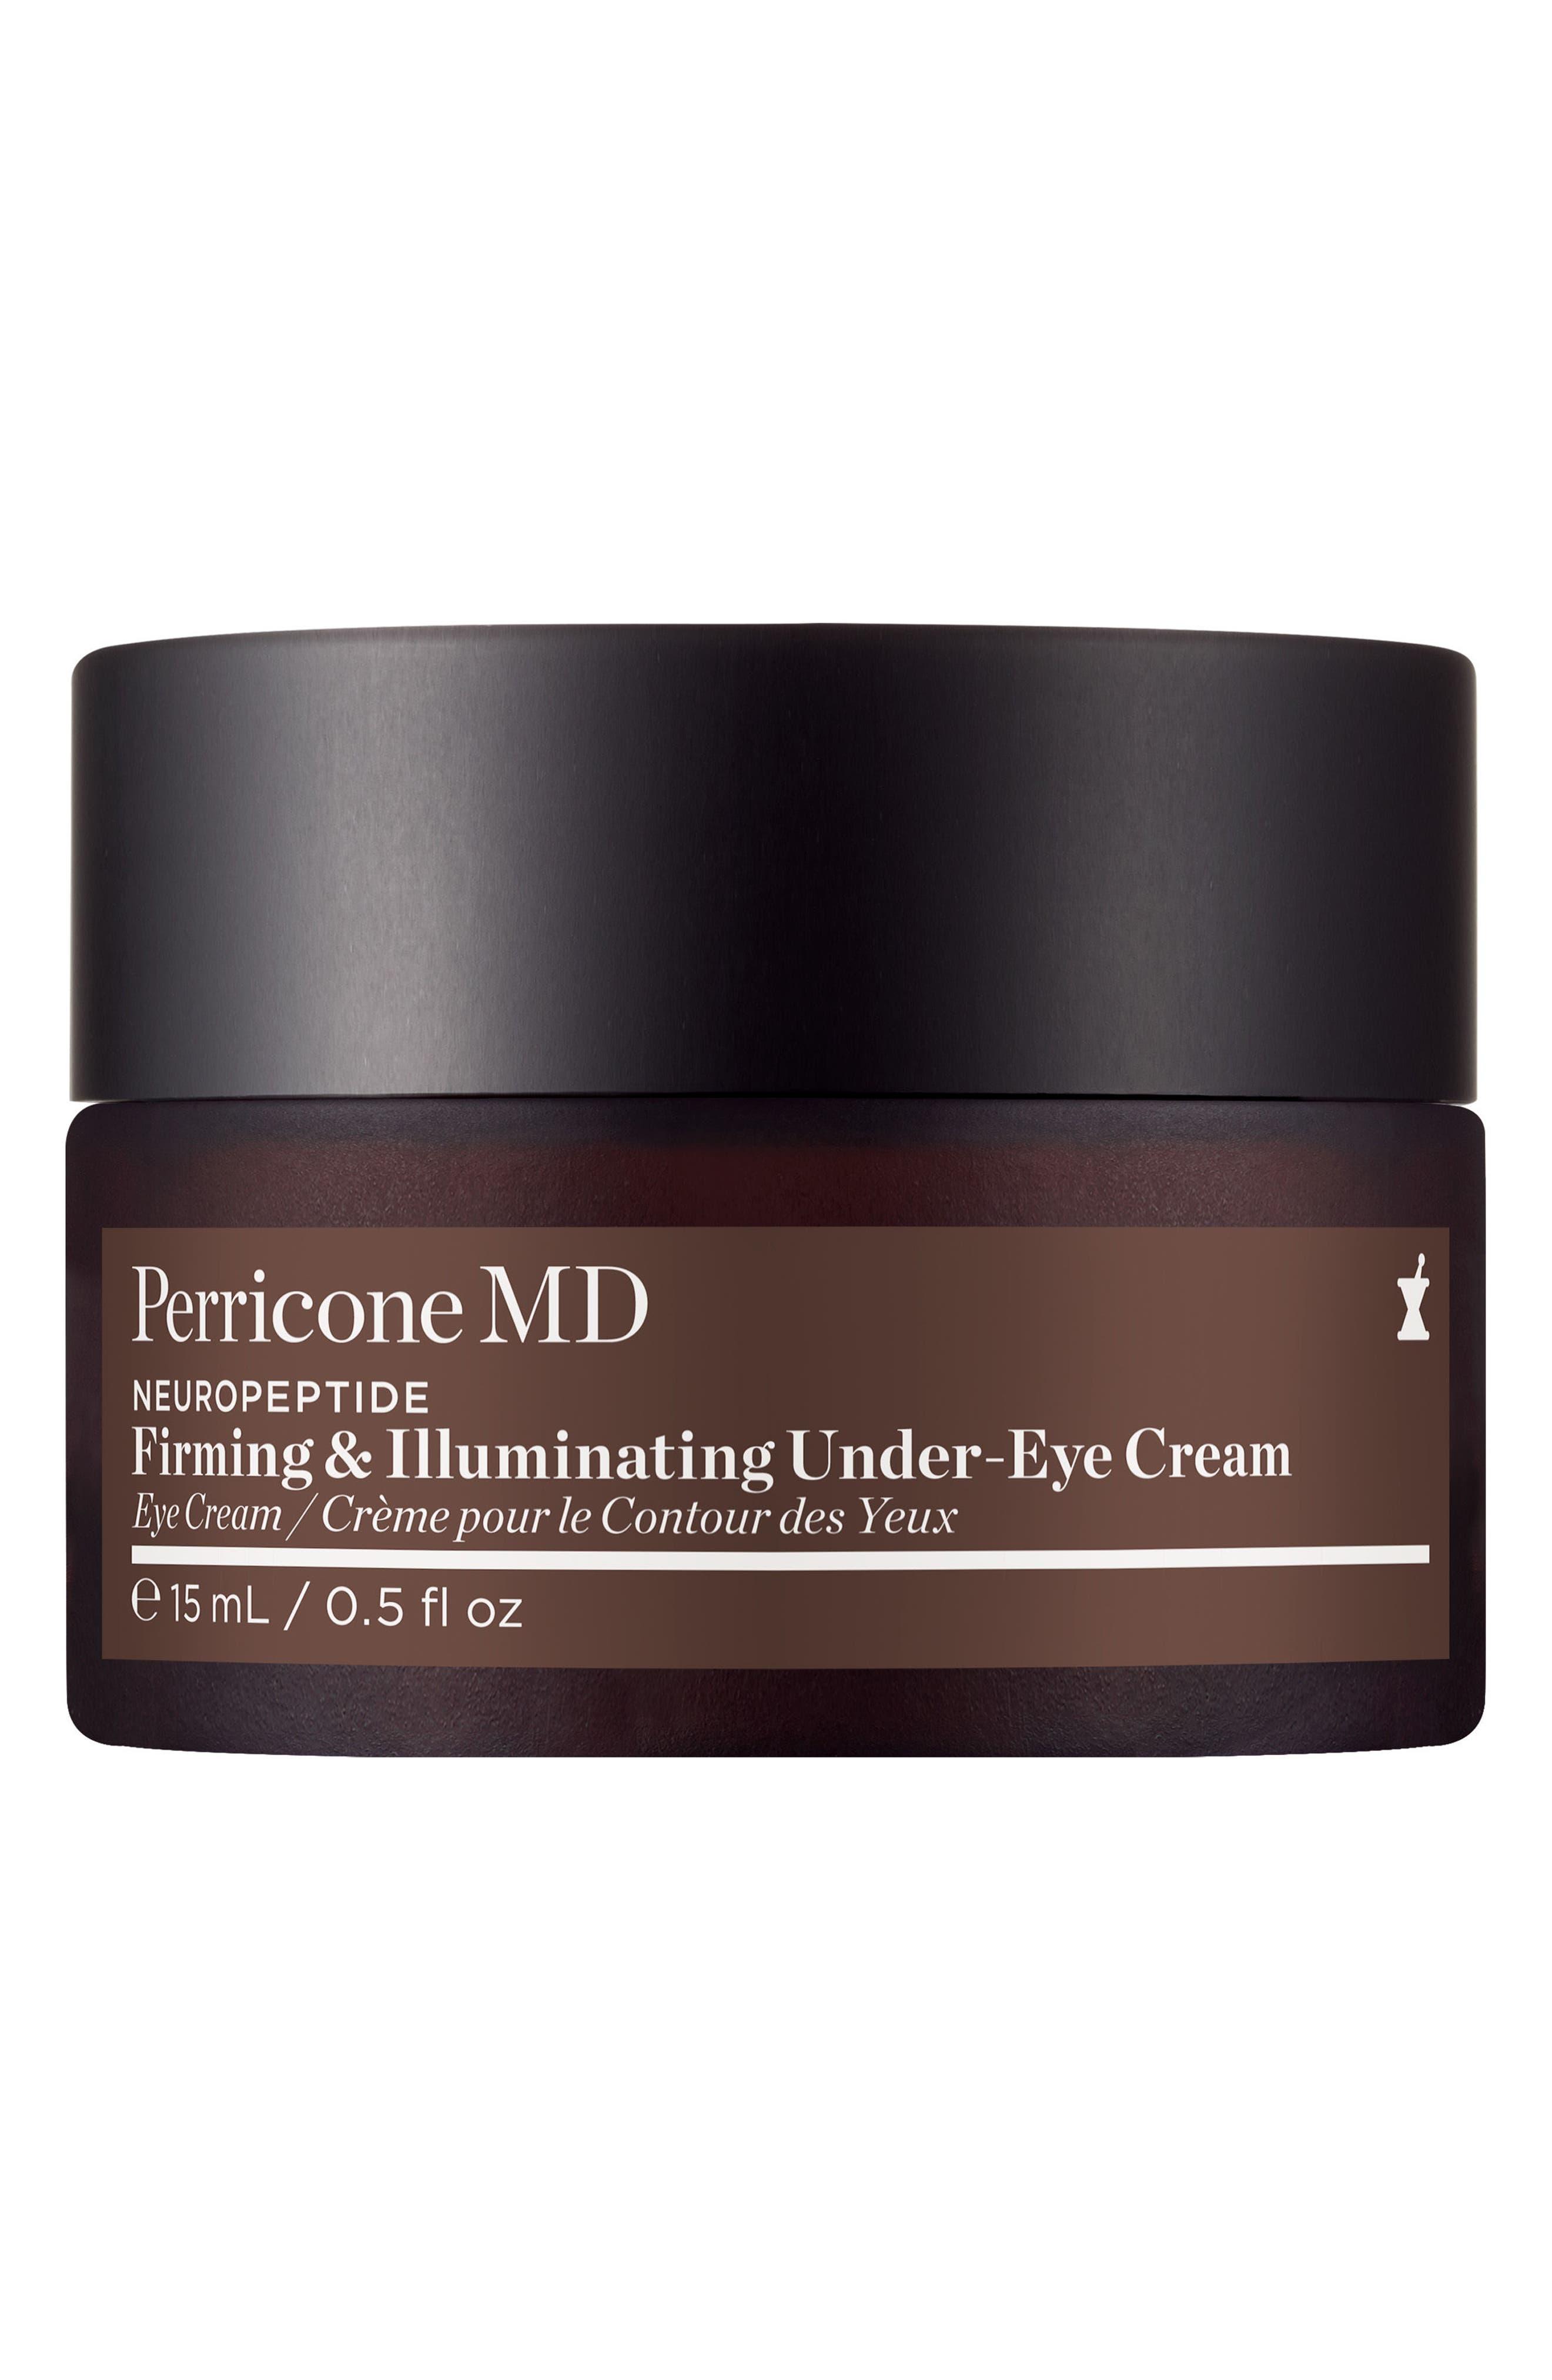 Neuropeptide Firming & Illuminating Undereye Cream,                             Main thumbnail 1, color,                             000